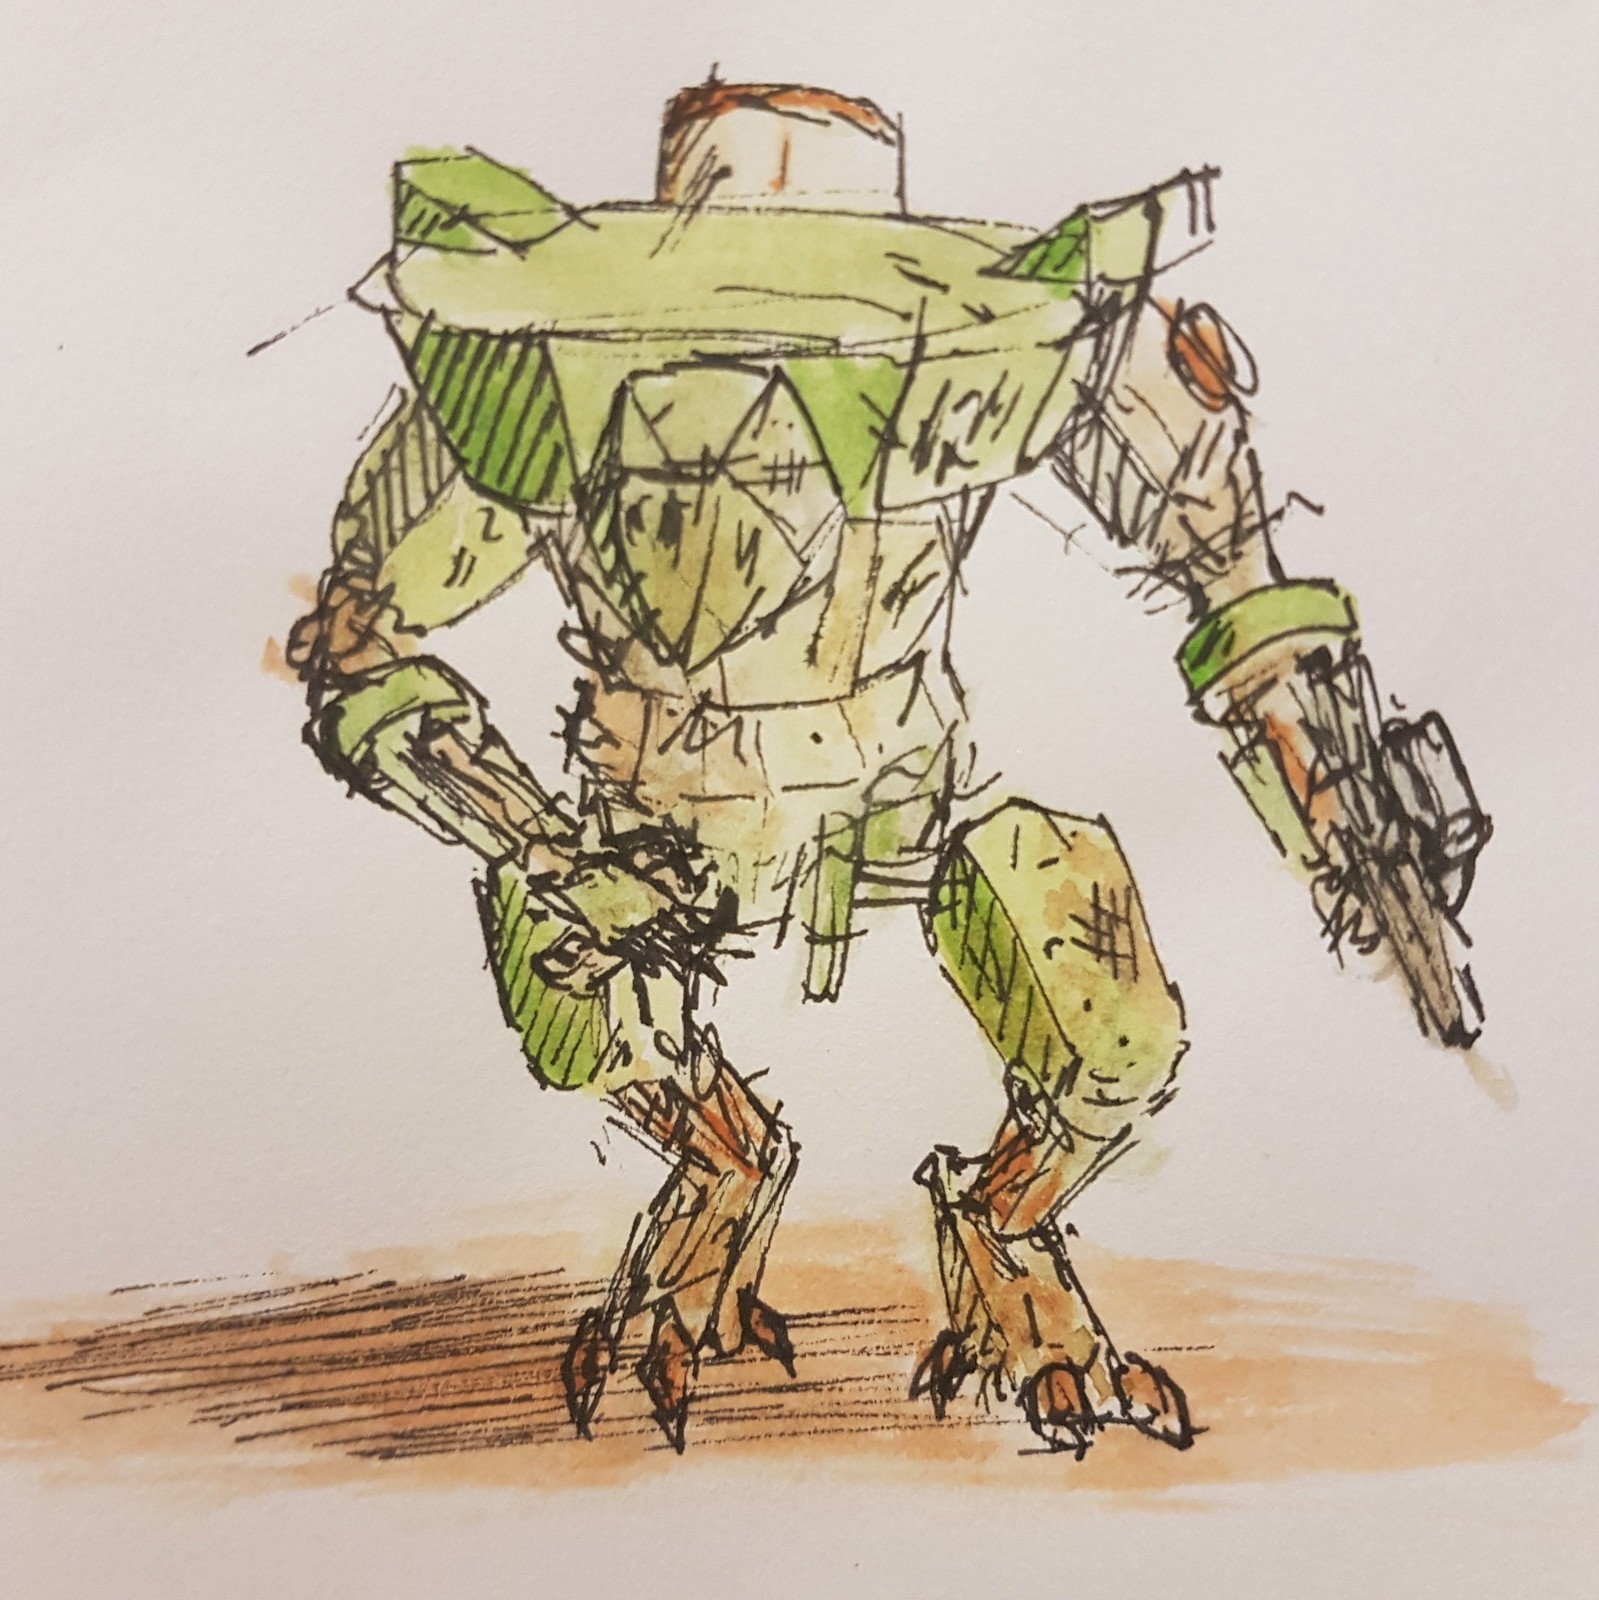 Dusty Warrior